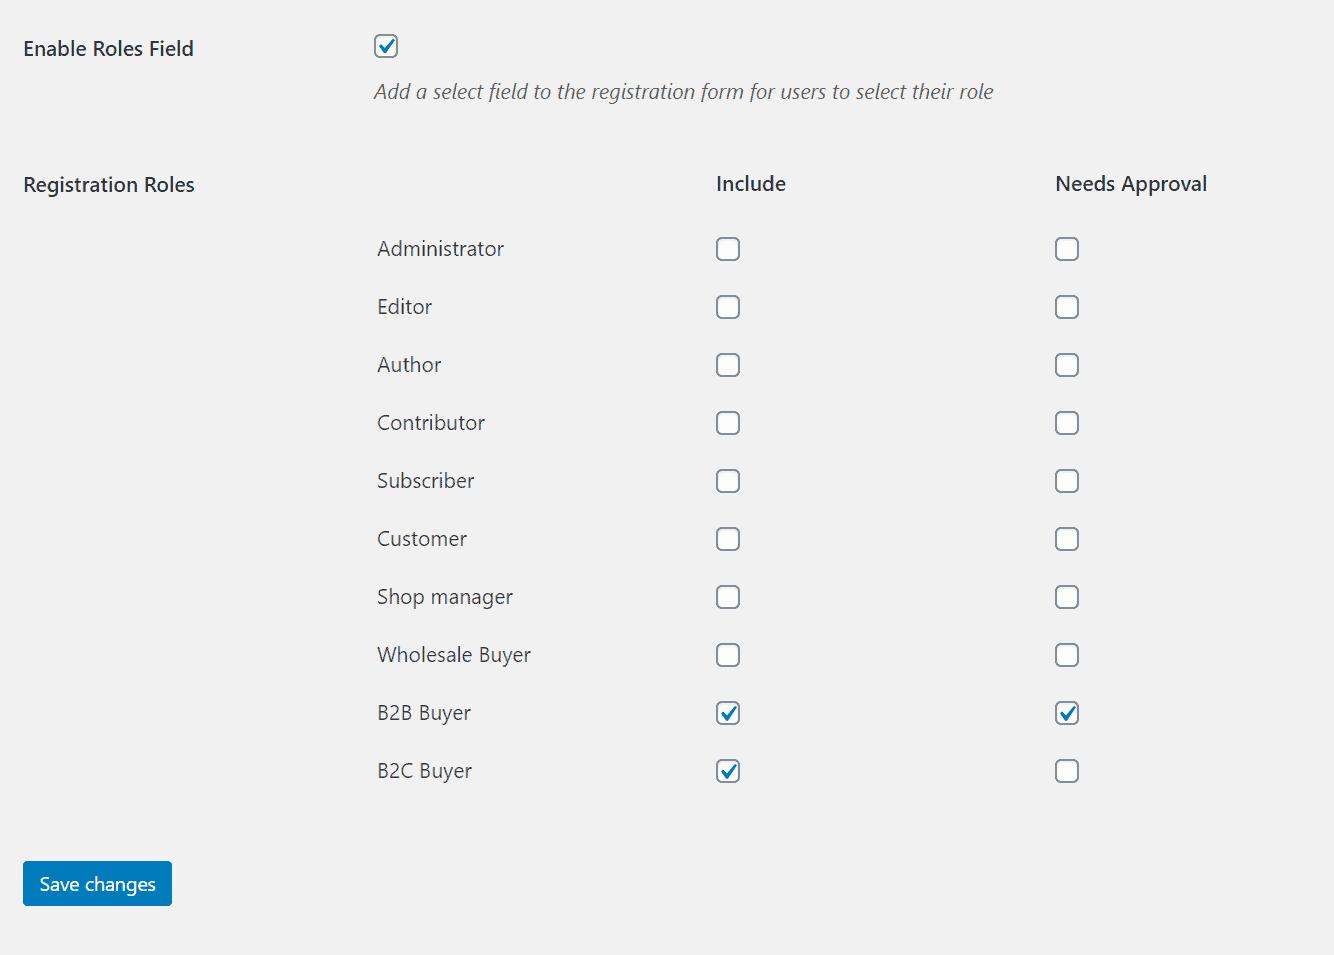 Add roles field in WooCommerce registration form